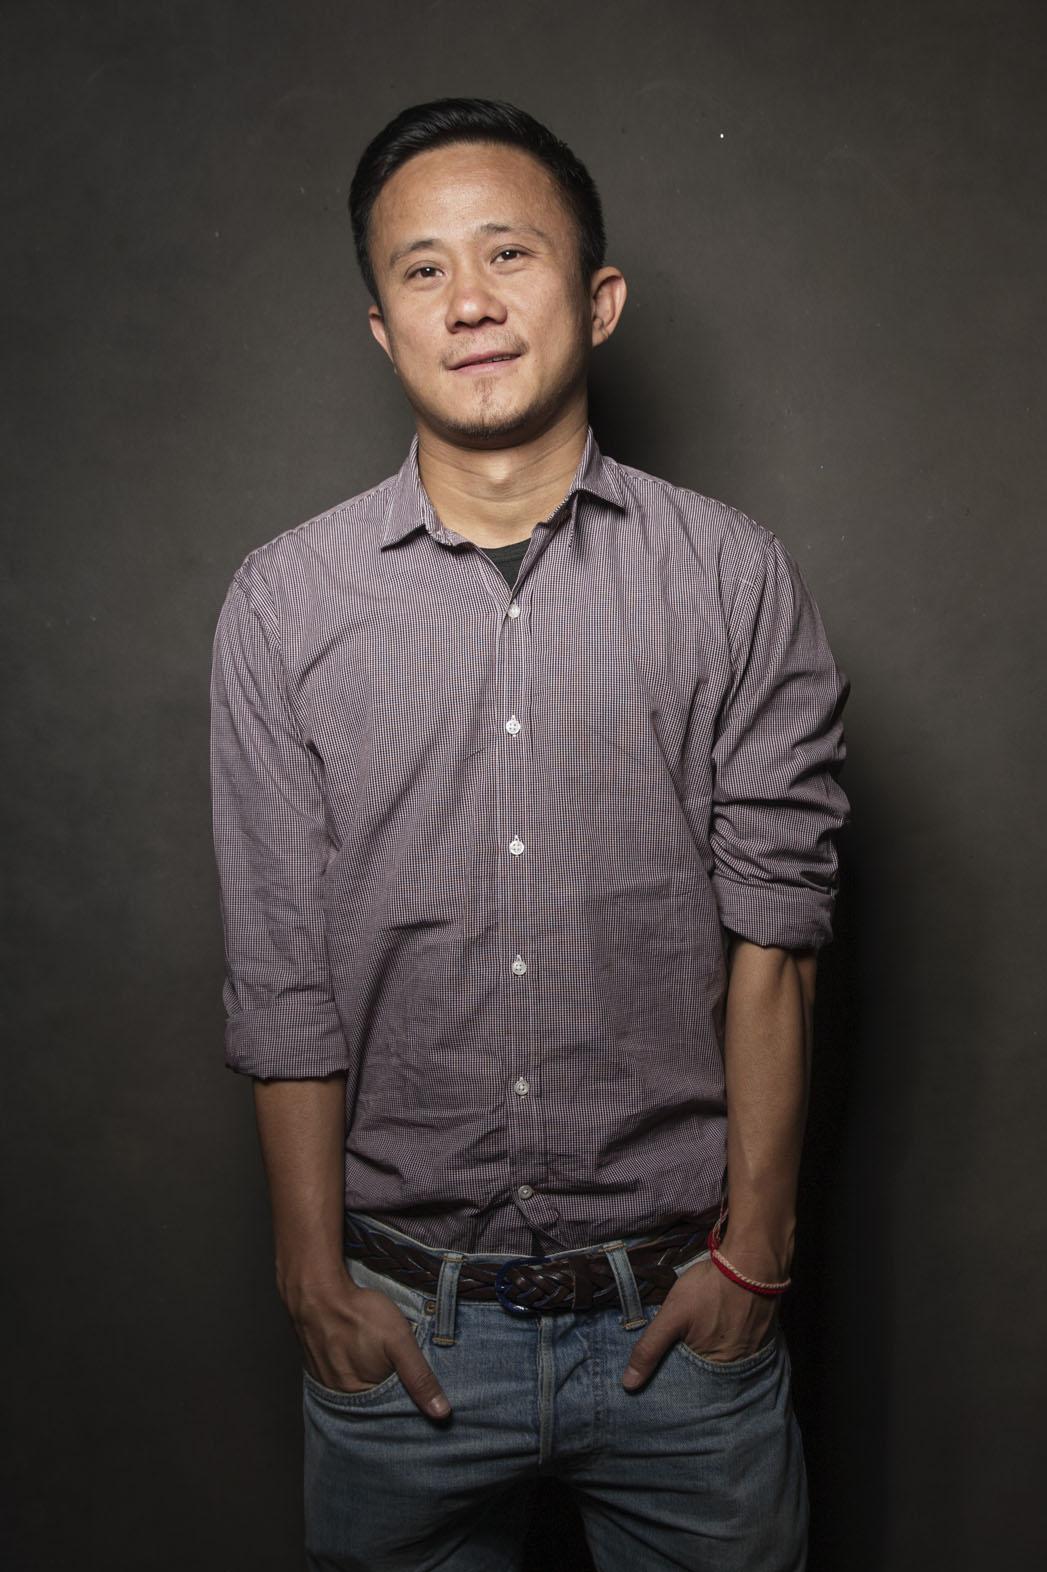 Hong Khaou Portrait Sundance - P 2014